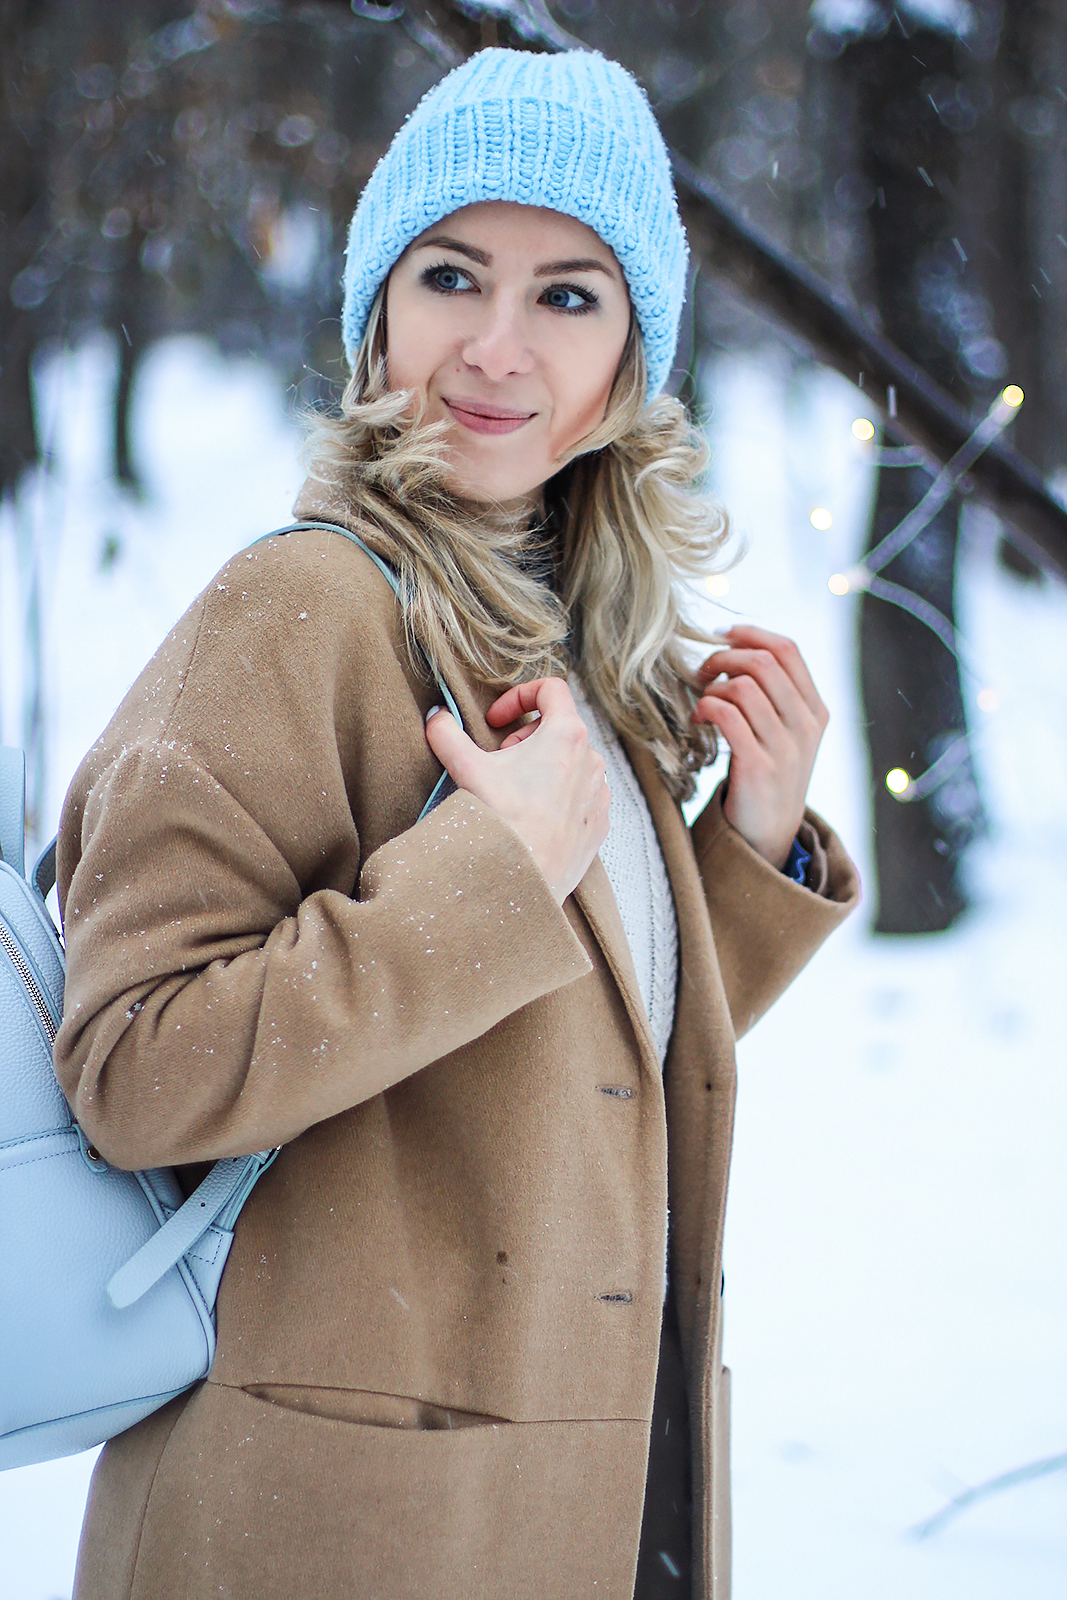 margarita_maslova_winter_look_blue_bini_hat_camel_coat312